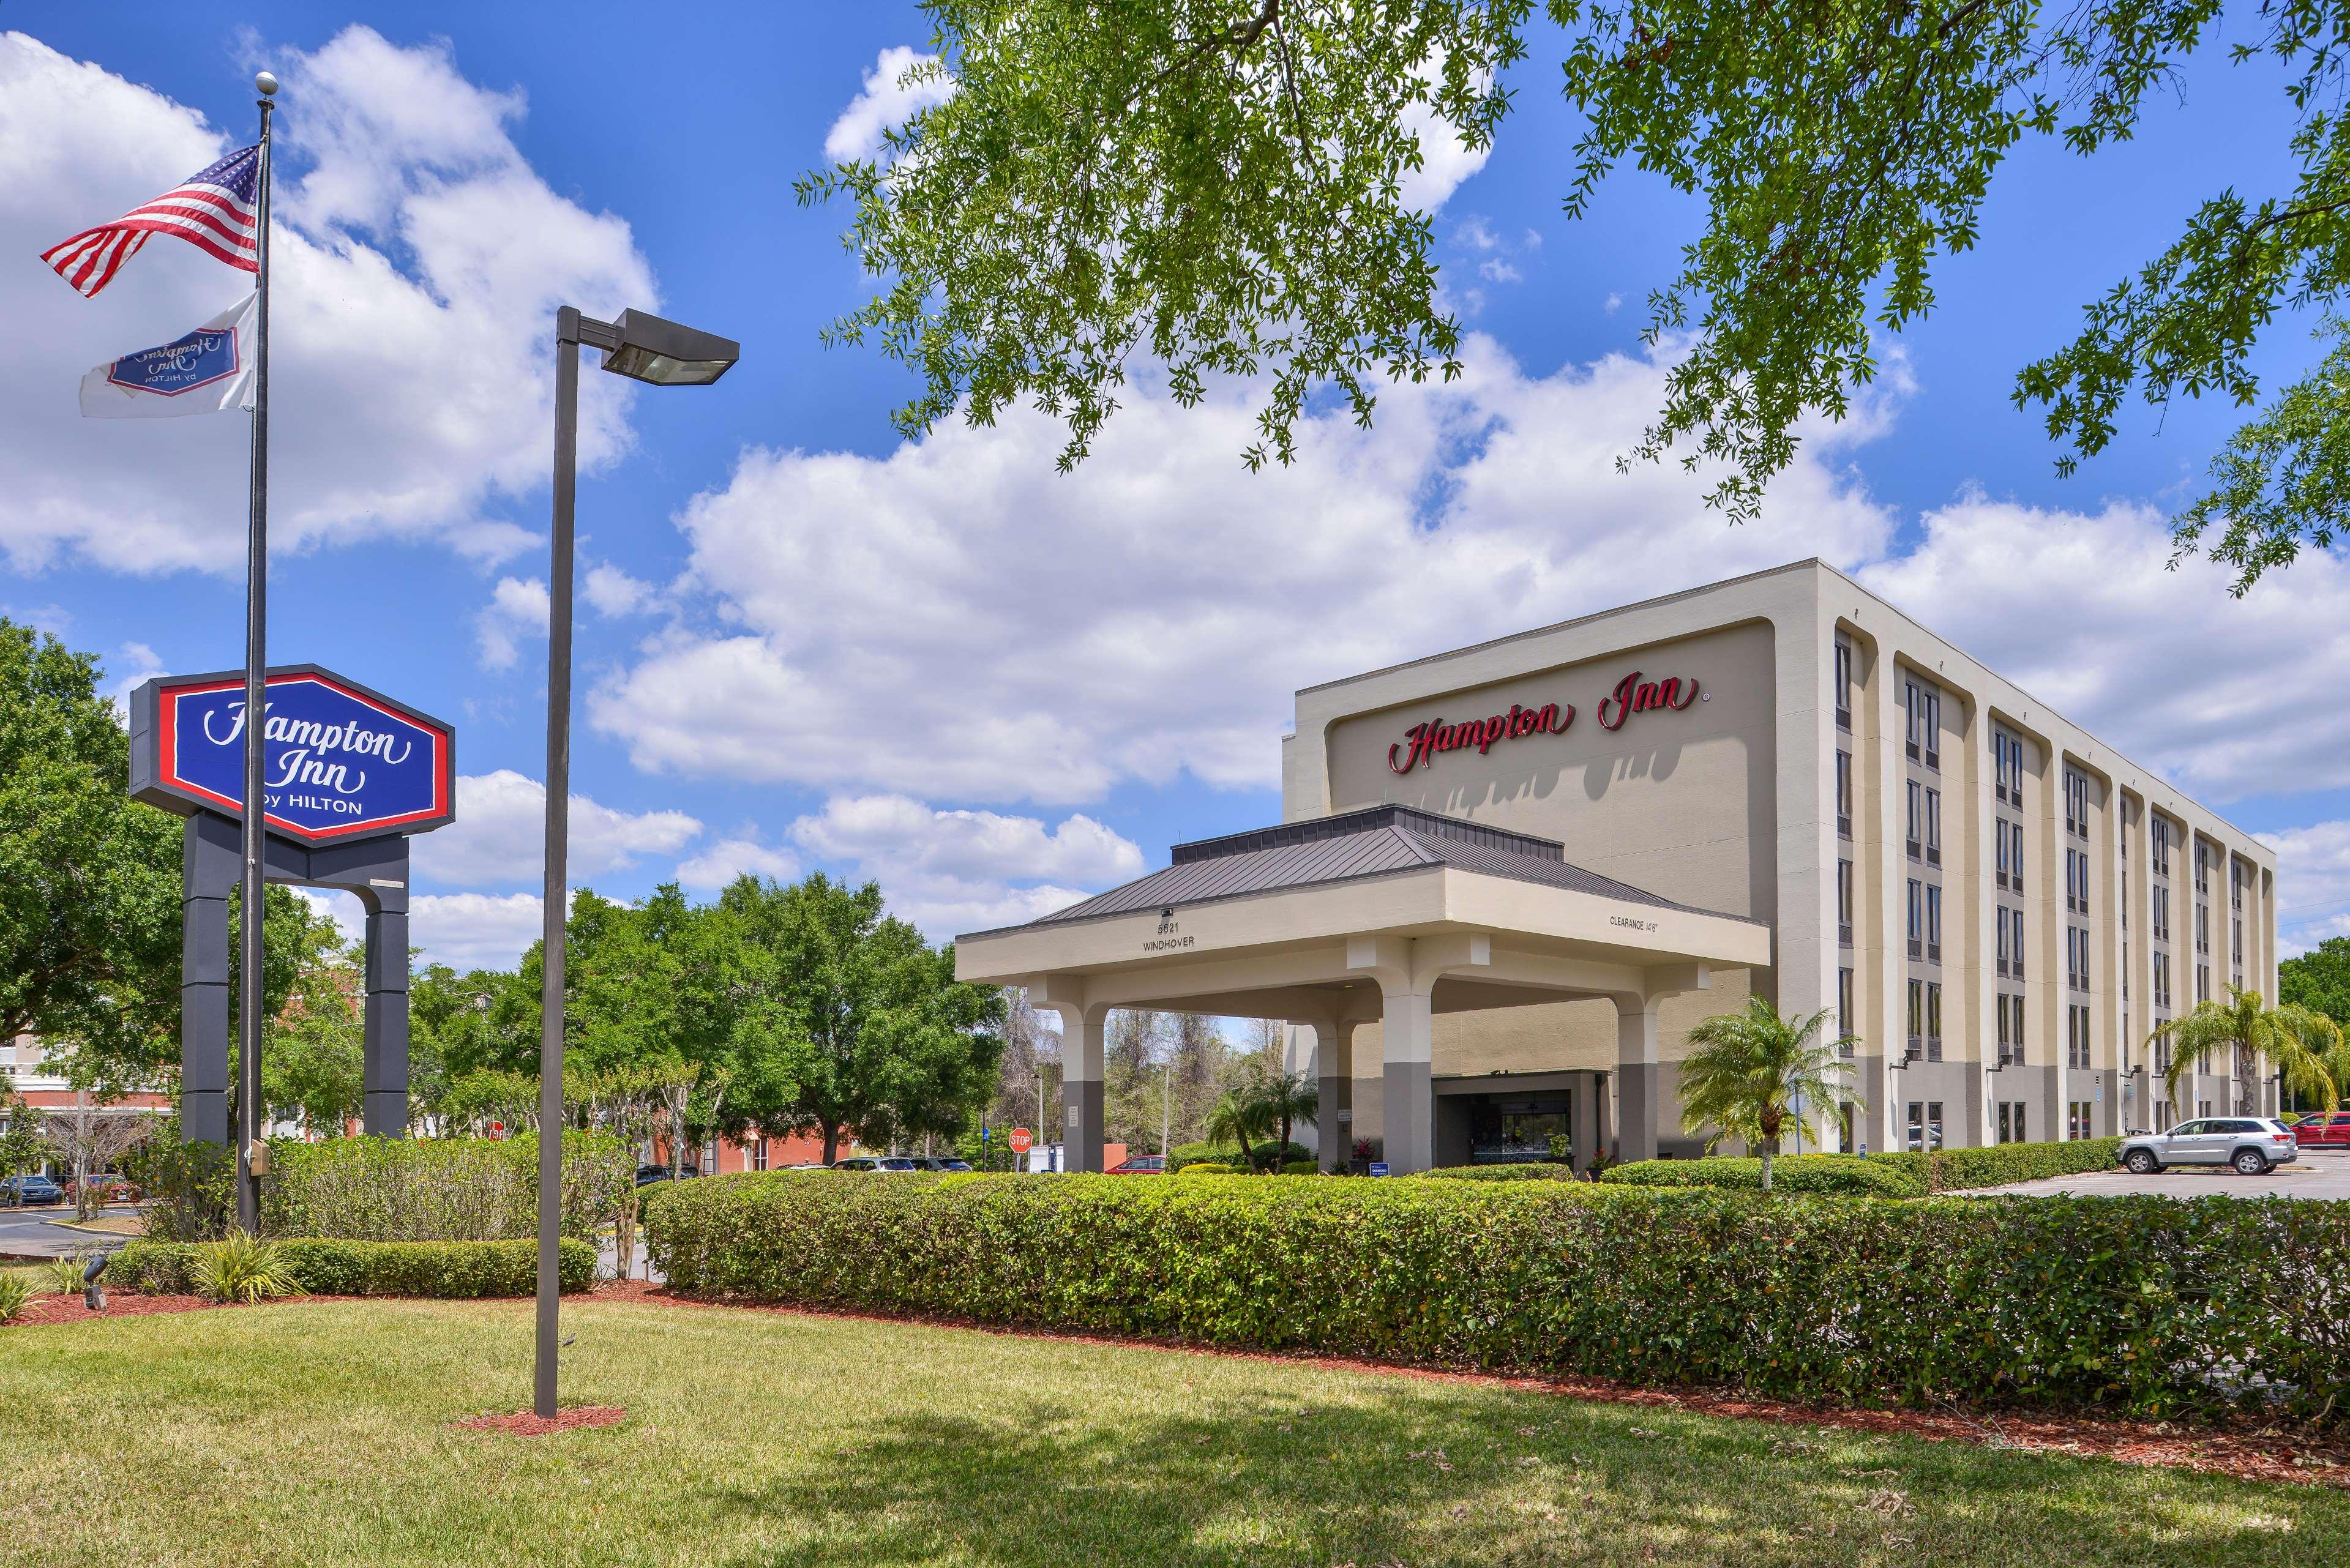 Hampton Inn closest to Universal Orlando image 3